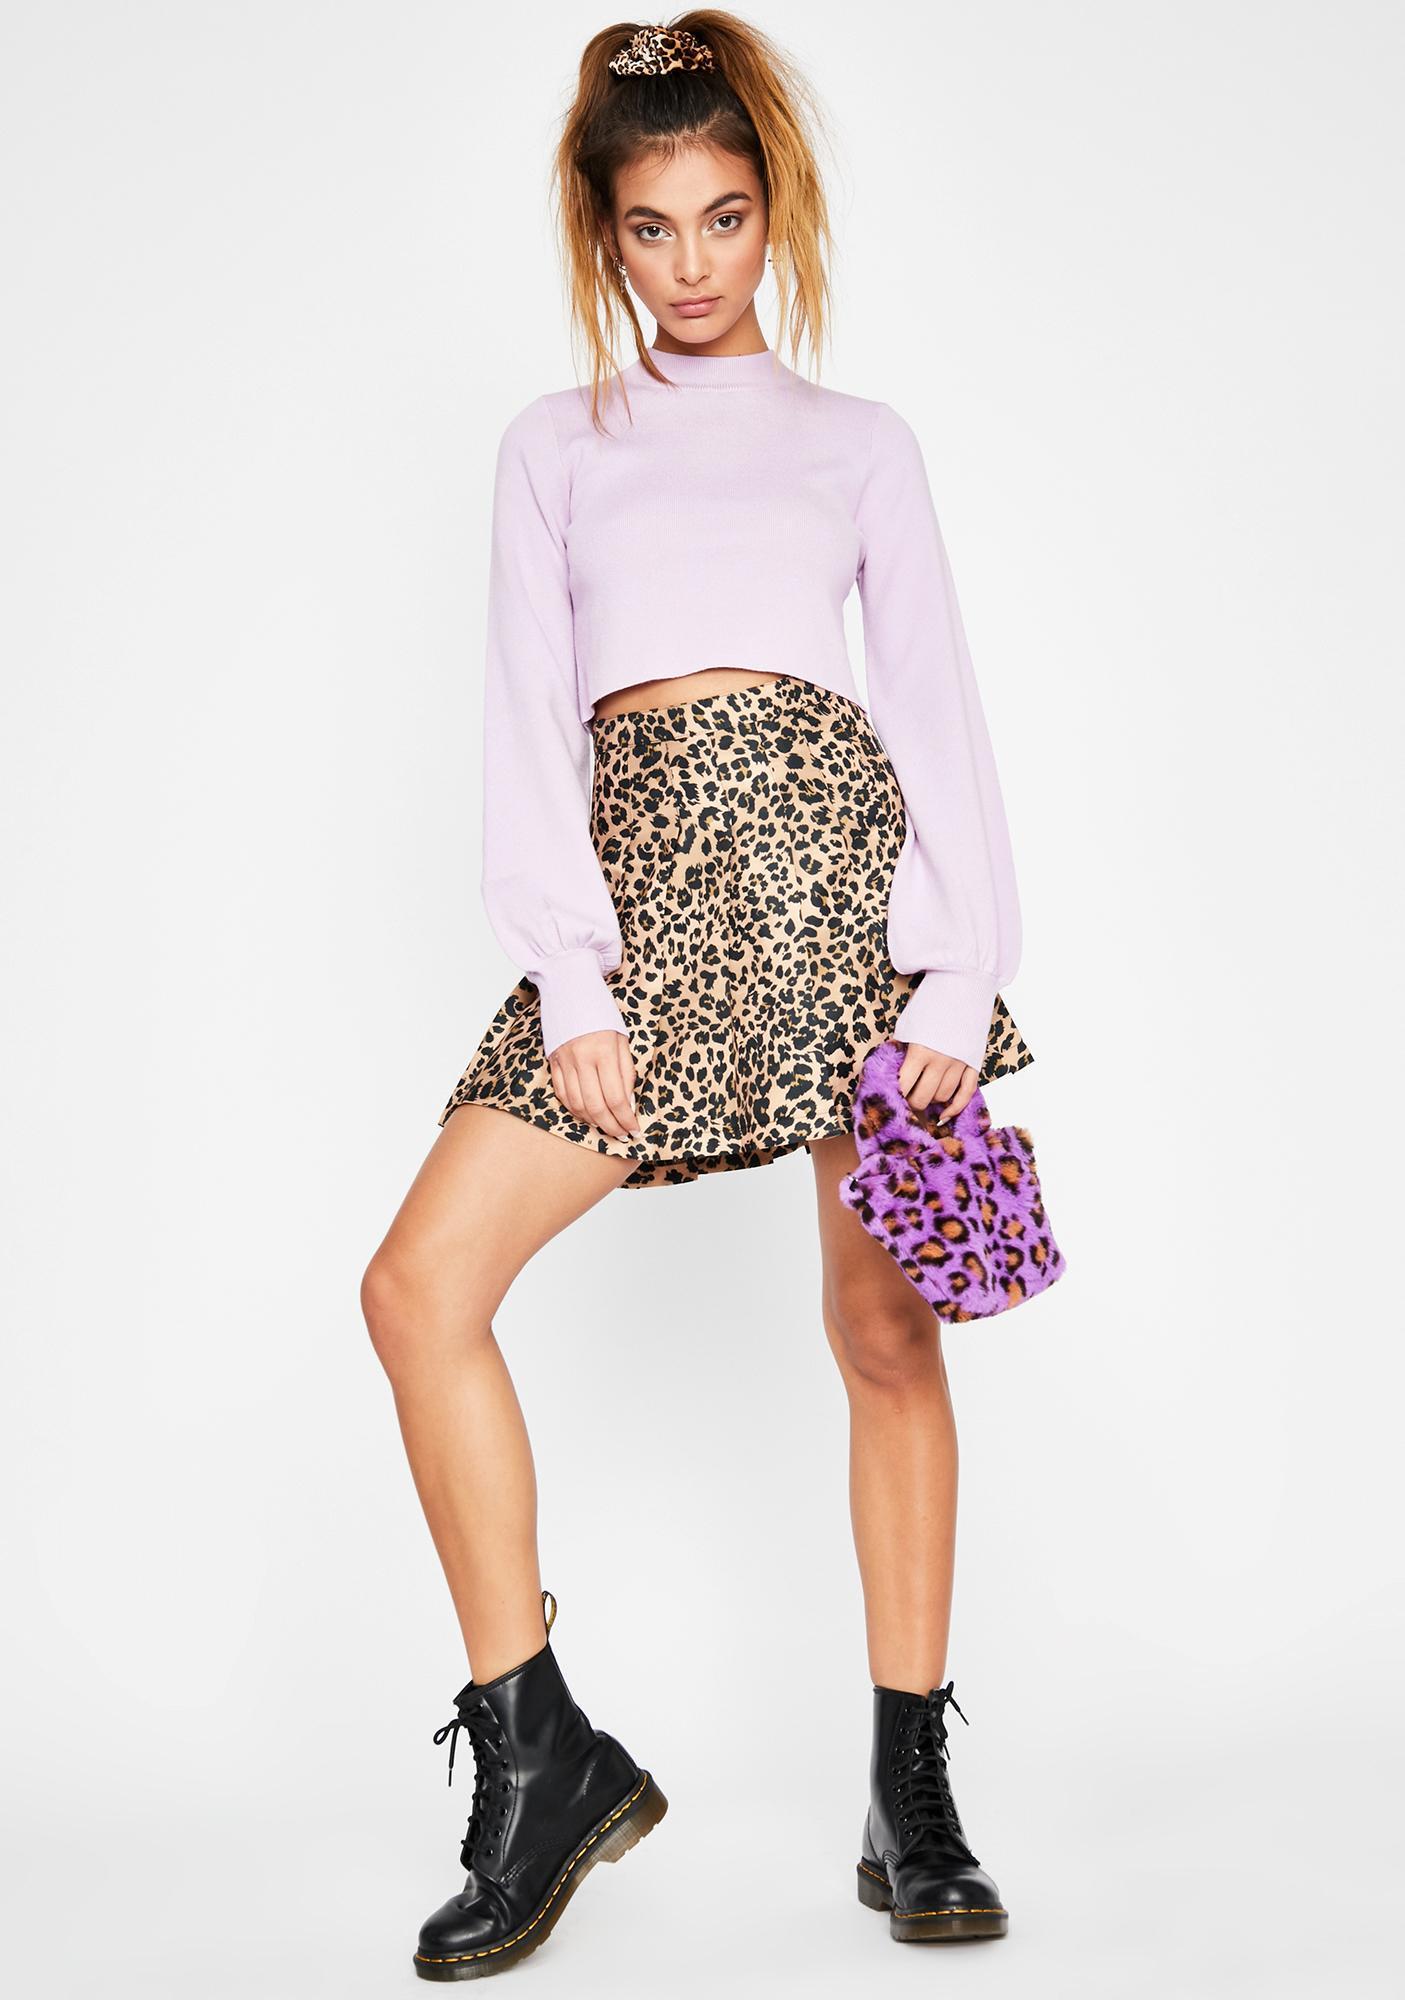 Grape No Foolin' Knit Sweater